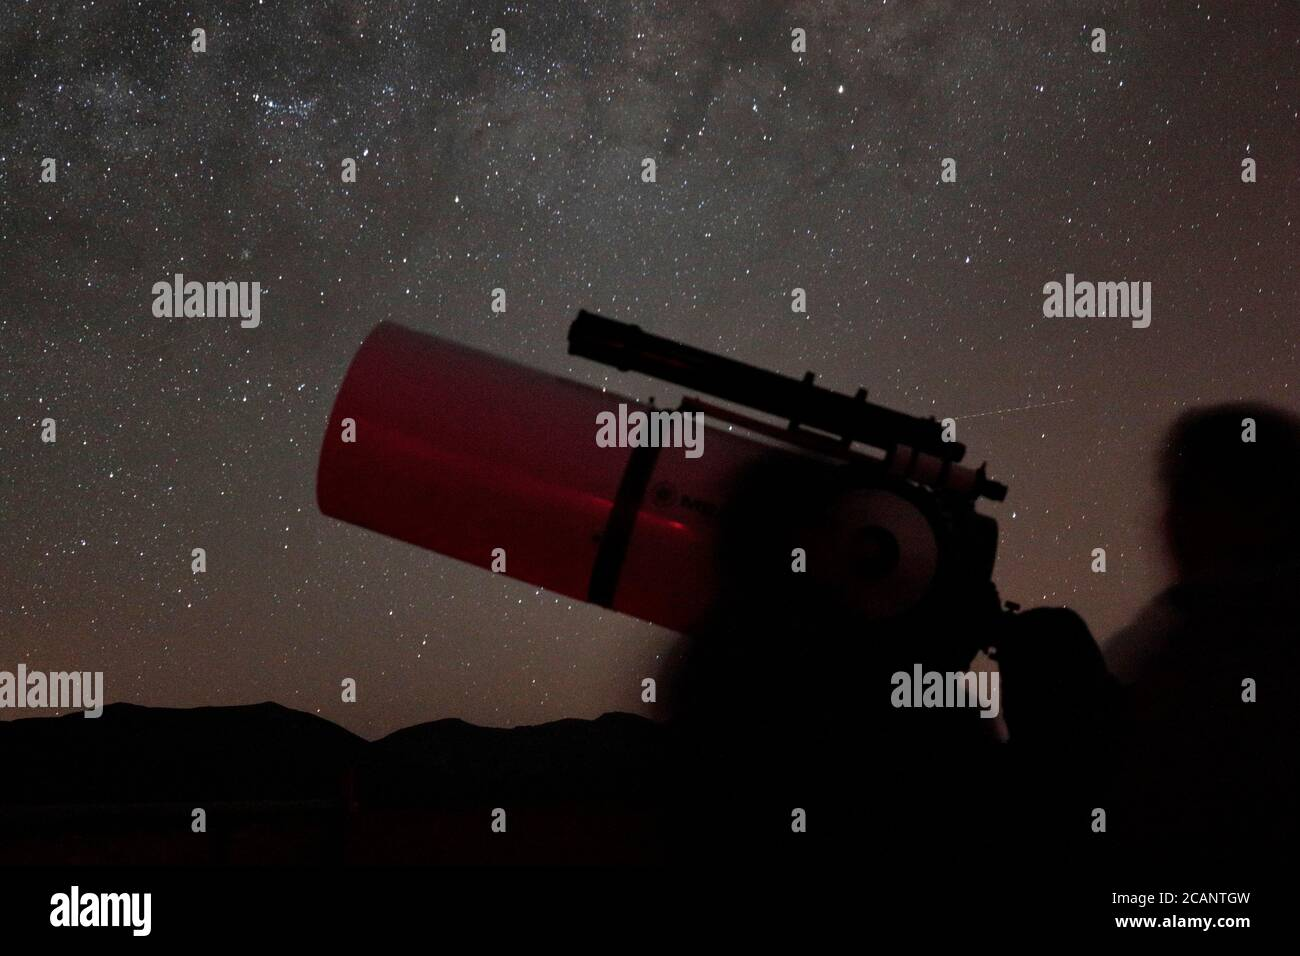 """Turismo Astronómico"" - Observatorio del Pangue, cerca de Vicuna, La Serena, centro de Chile 12 Oct 2017 Foto de stock"